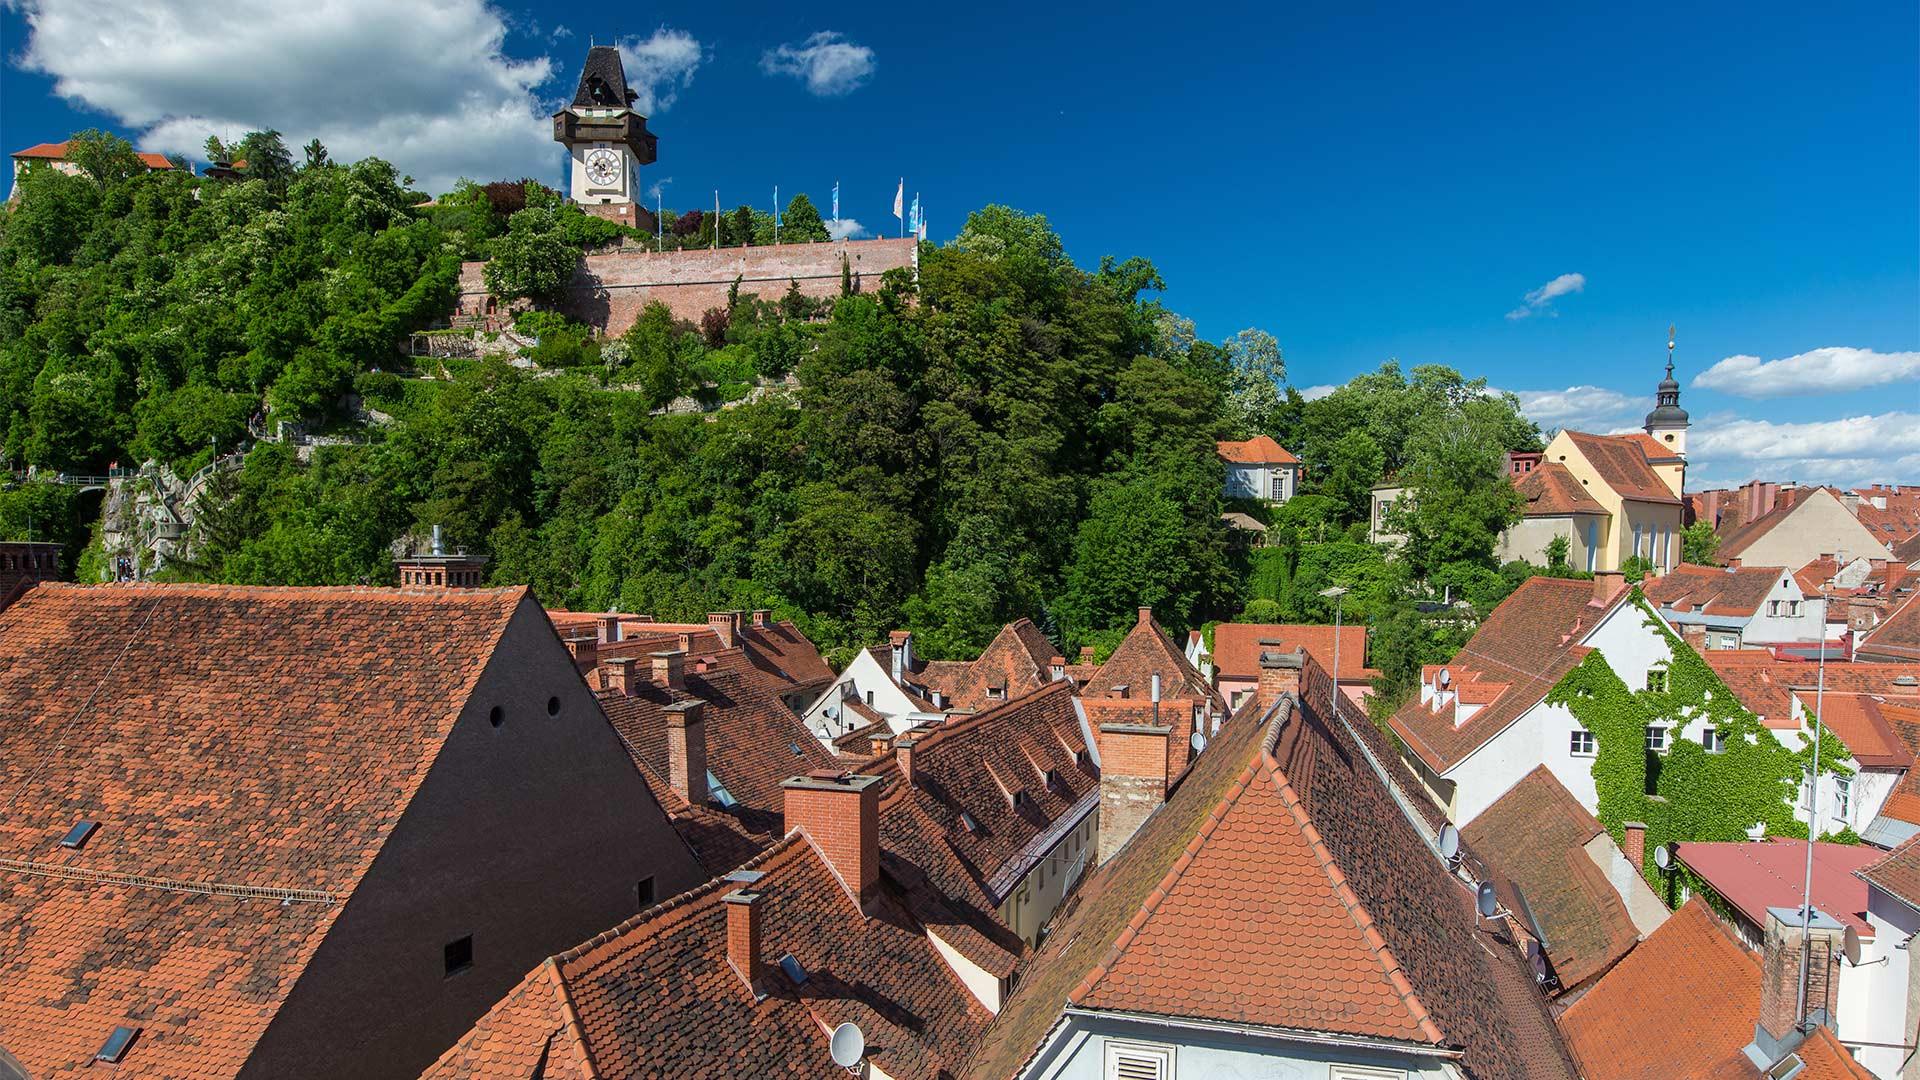 City views in Graz, Austria